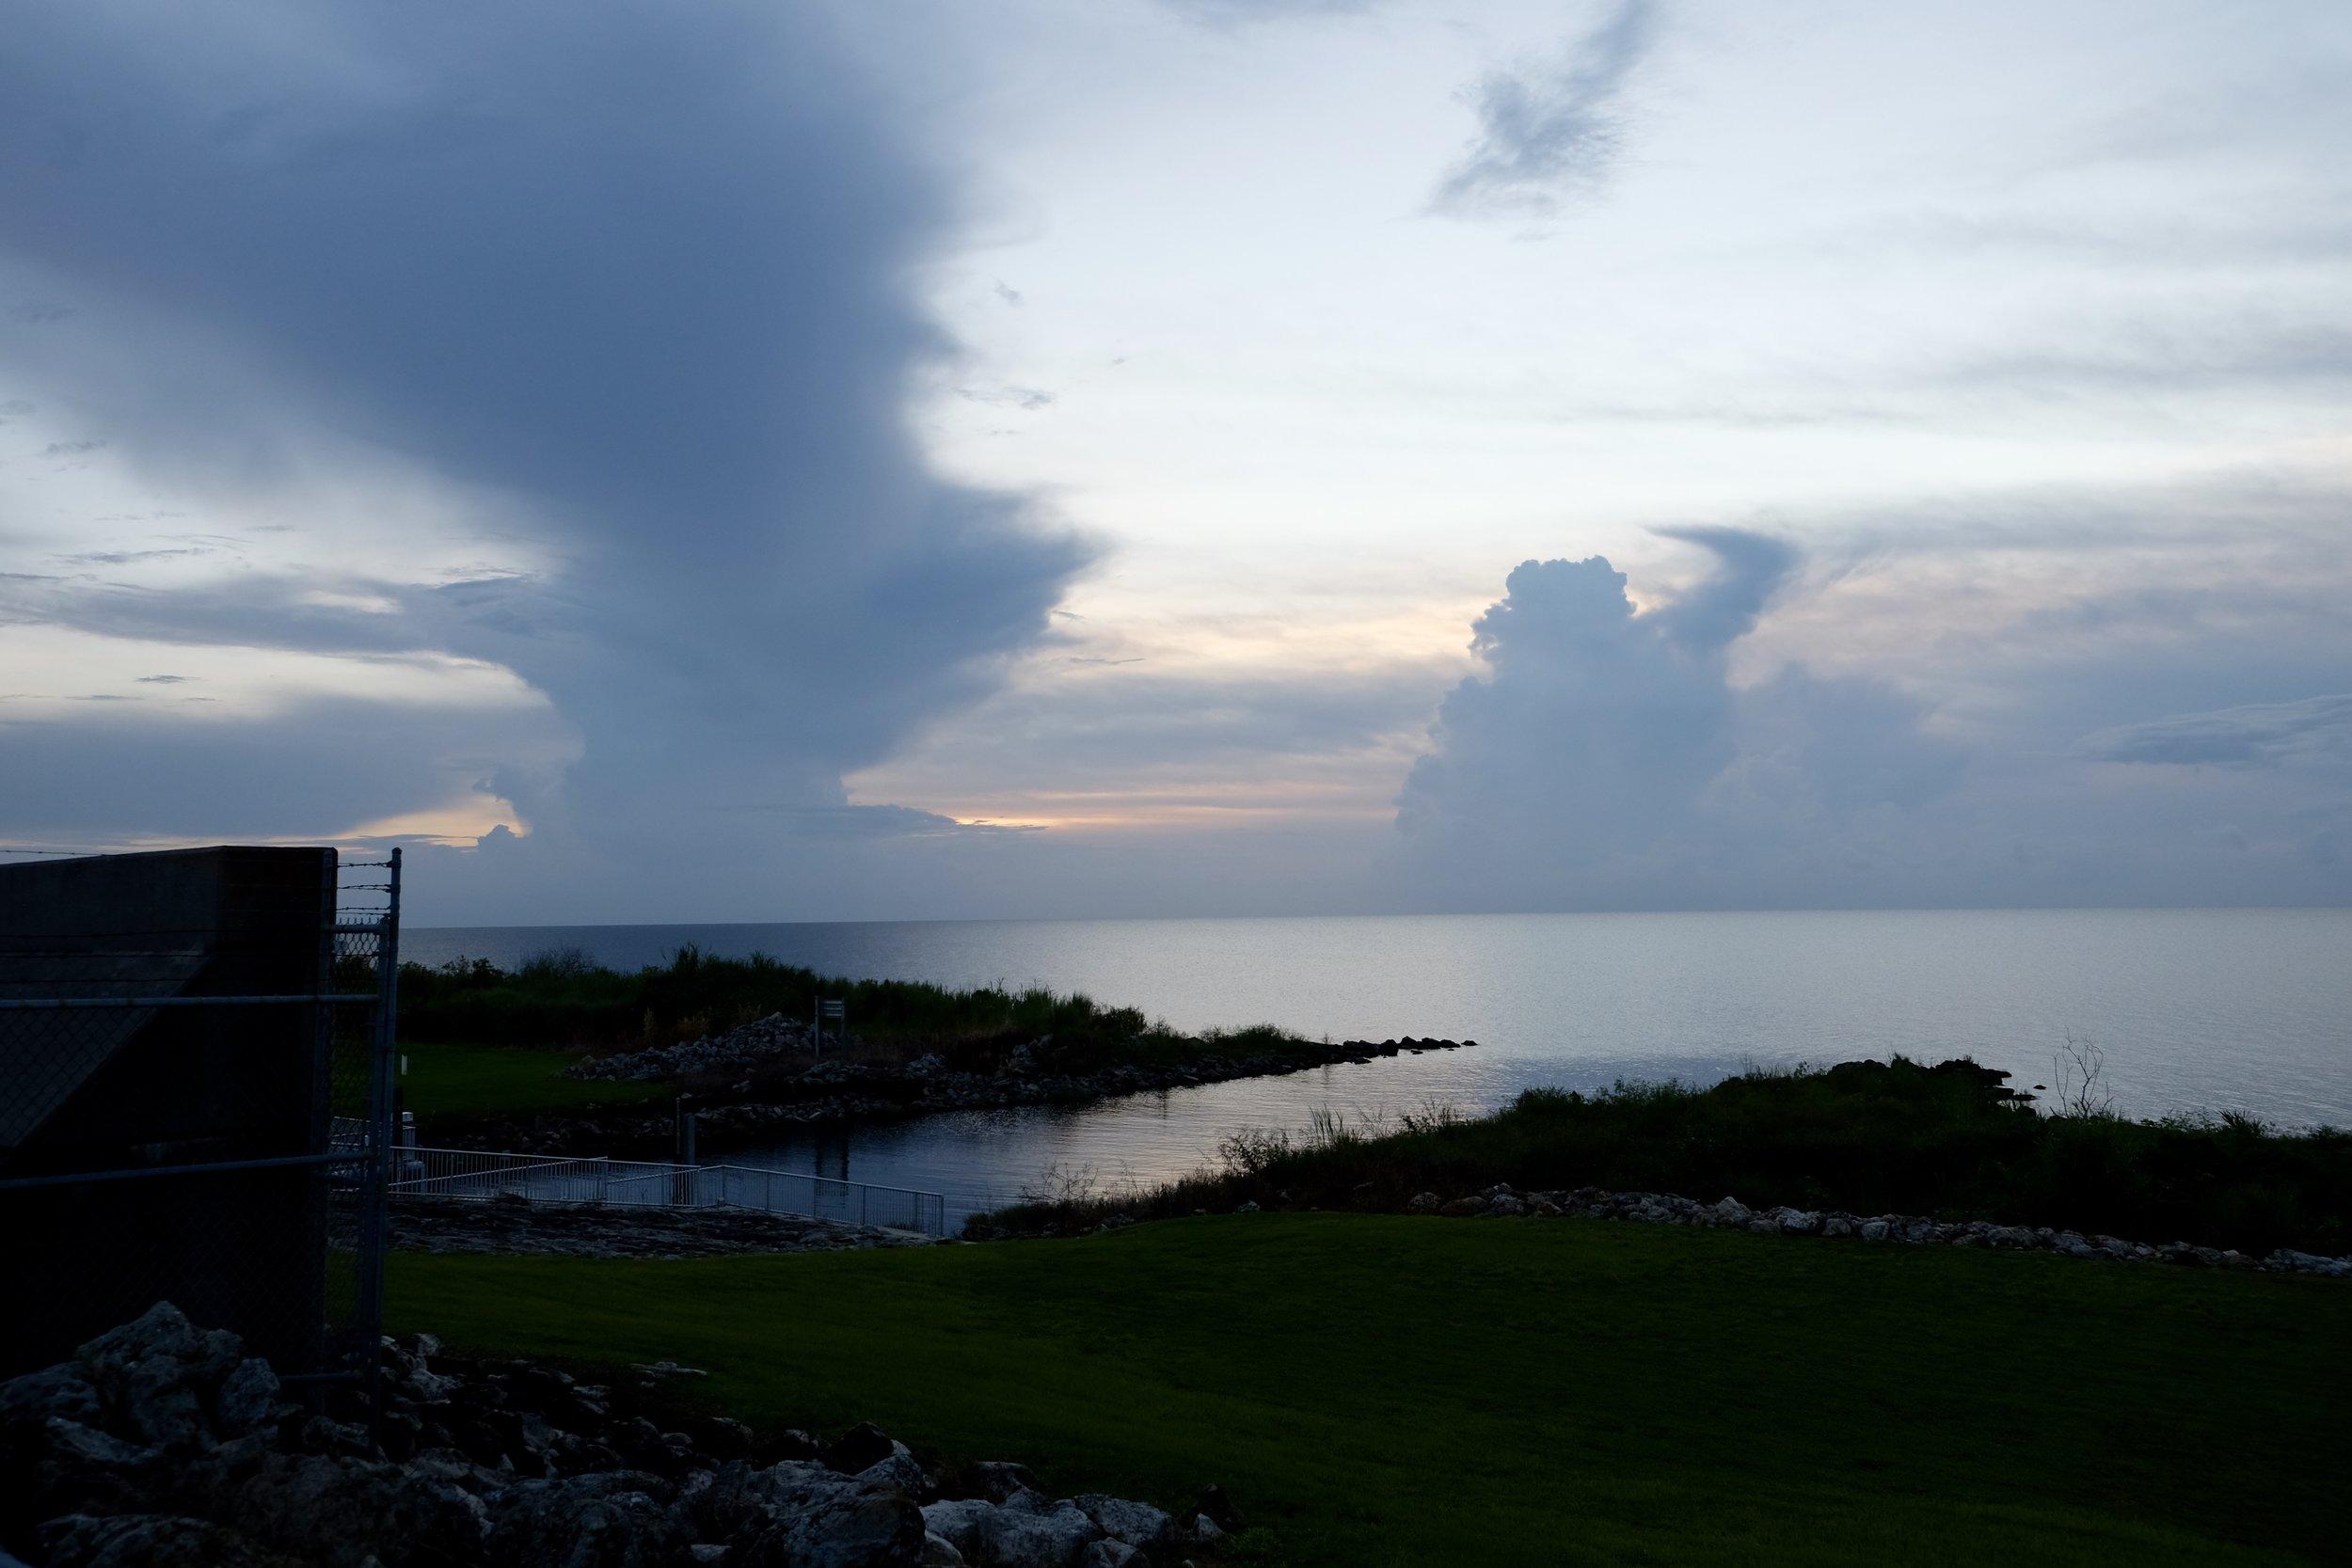 Lake Okeechobee: Canal Point